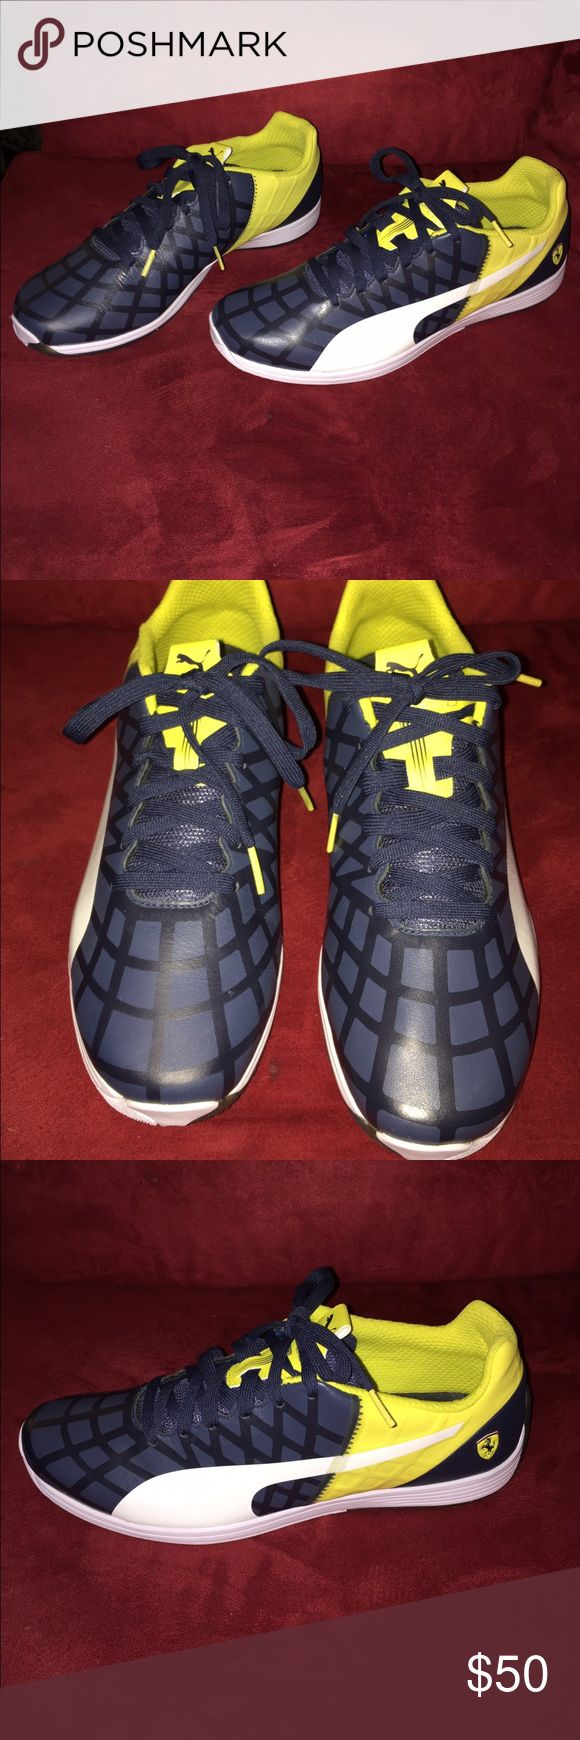 PUMA EVOSPEED SNEAKERS PUMA EVOSPEED  BLUE TELLOW N QHITE SNEAKERS NEW WITHOUT BIX NEVER WORN SIZE MEN 11 Shoes Sneakers